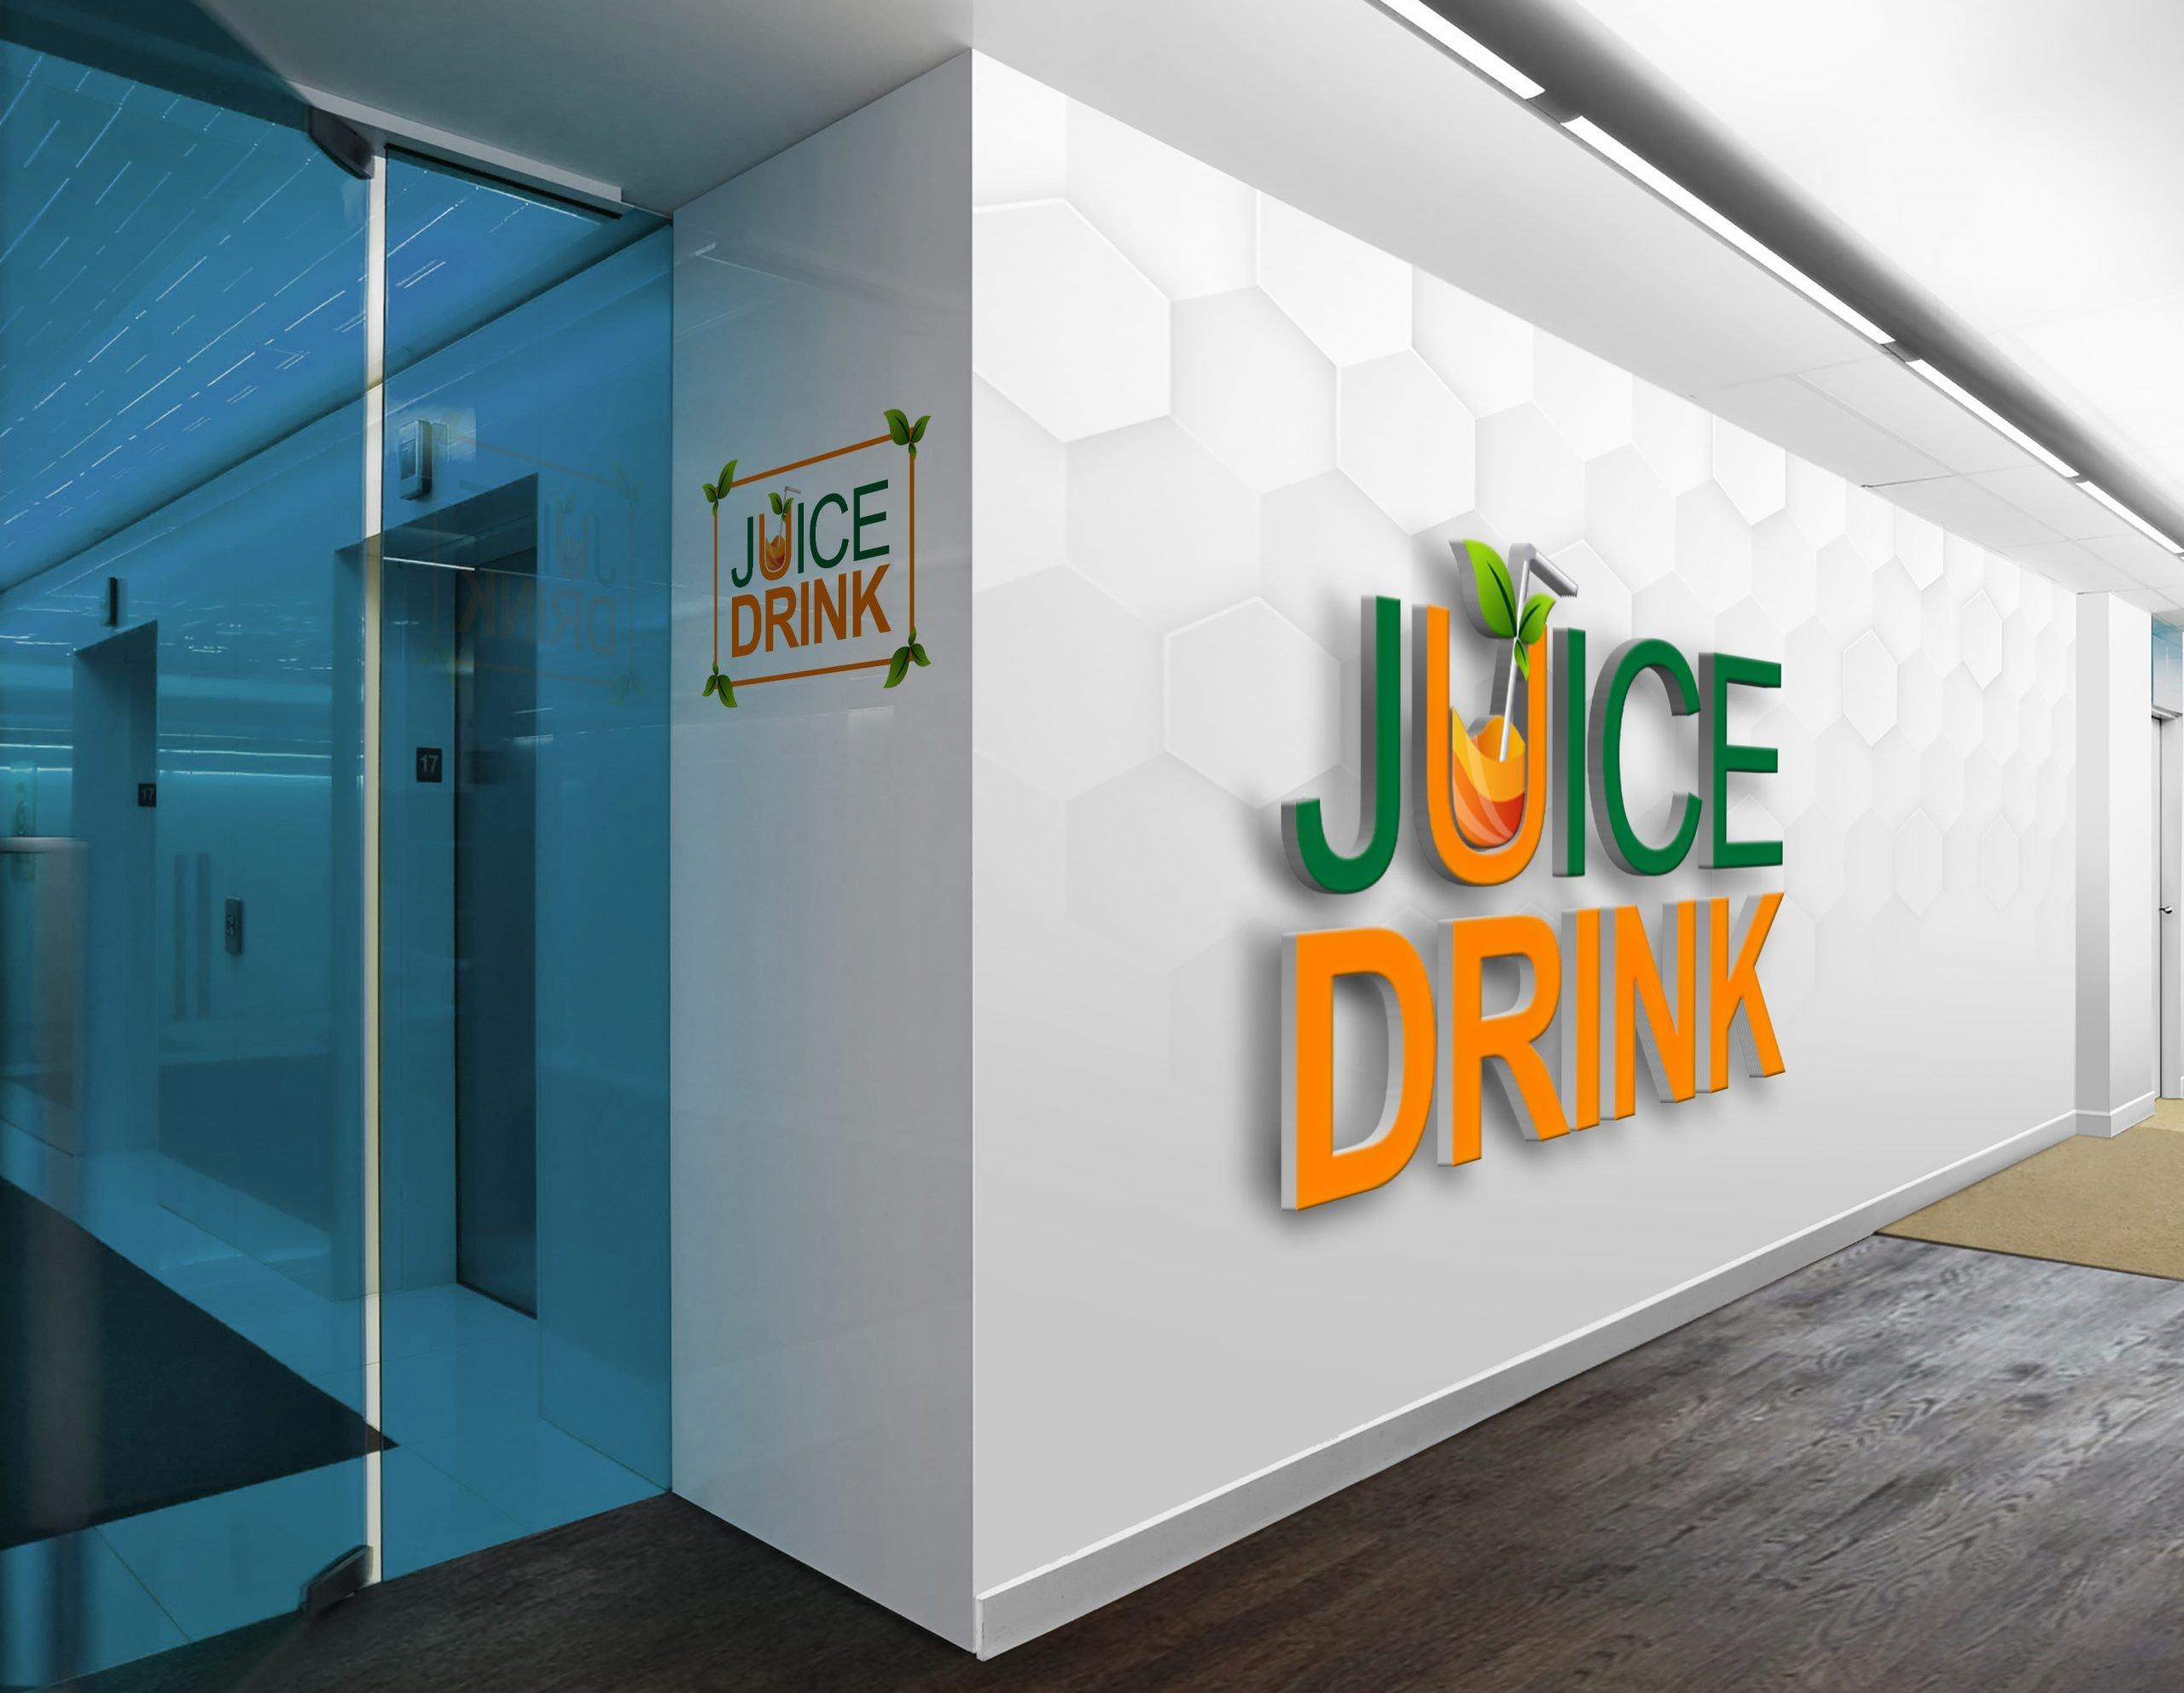 Free Psd Juice Drink Logo Design on office wall